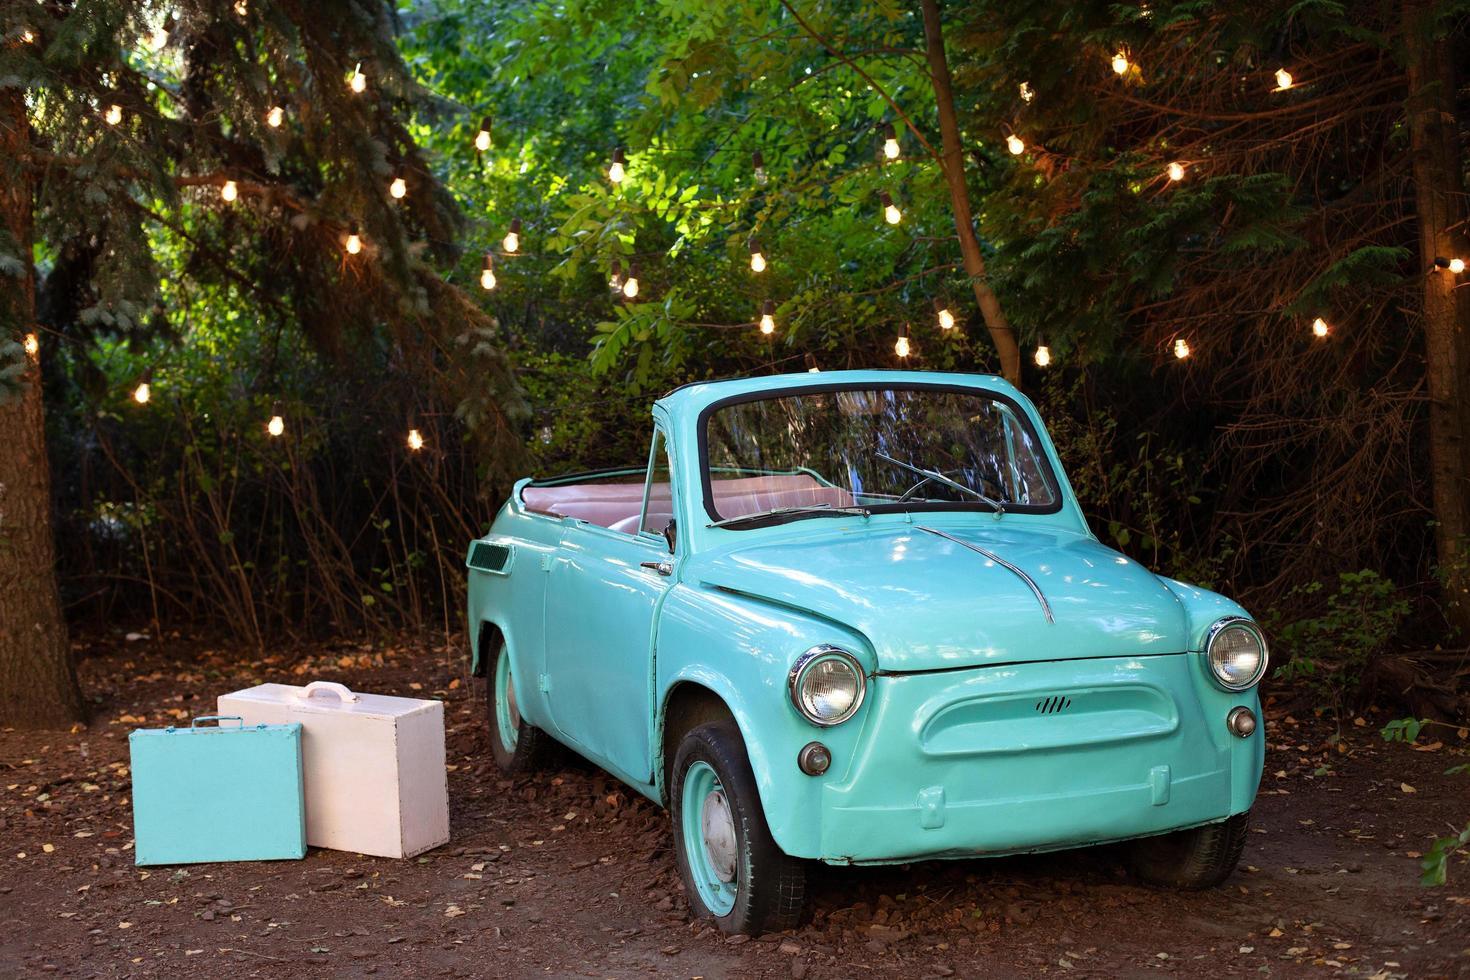 Retro kleines altes türkisfarbenes Auto foto